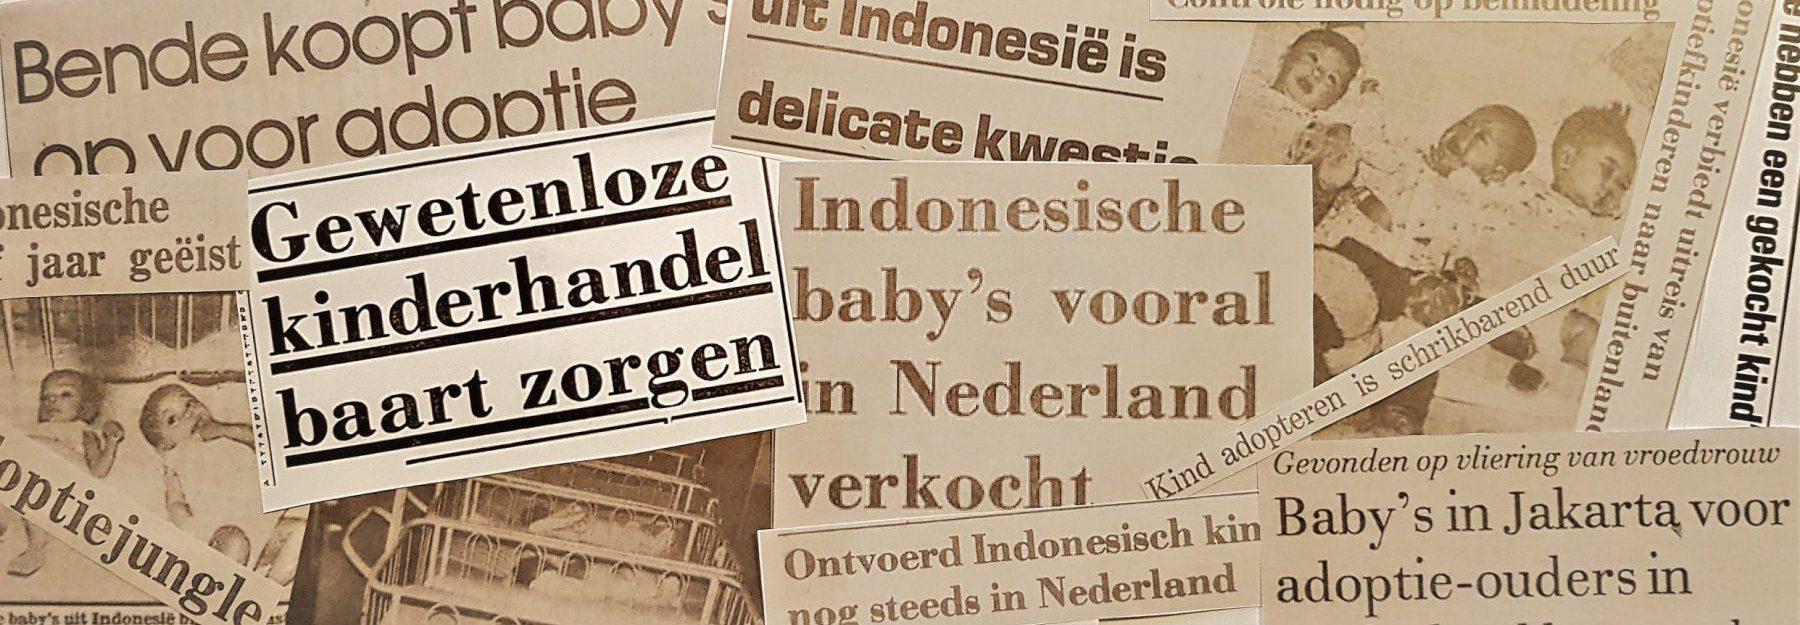 kinderhandel Indonesie